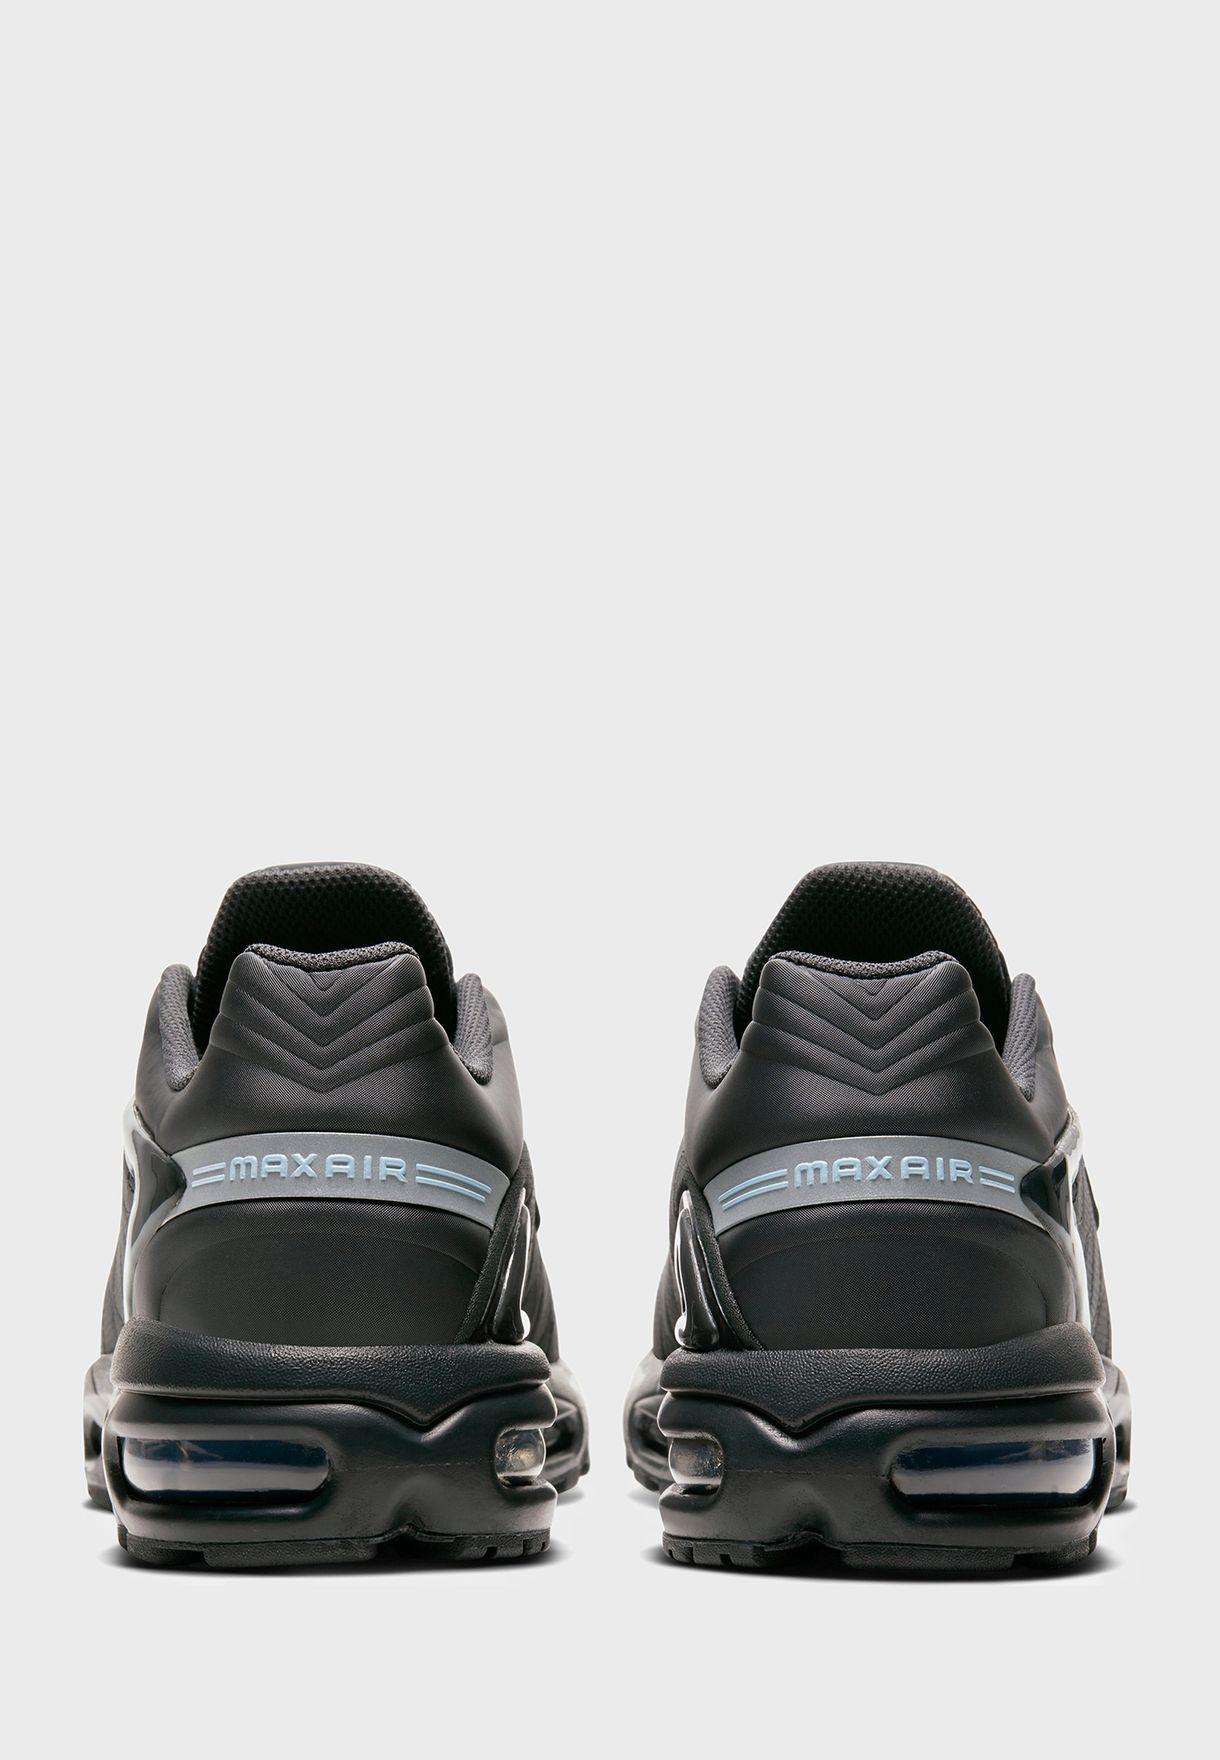 حذاء اير ماكس تيلويند في اس بي